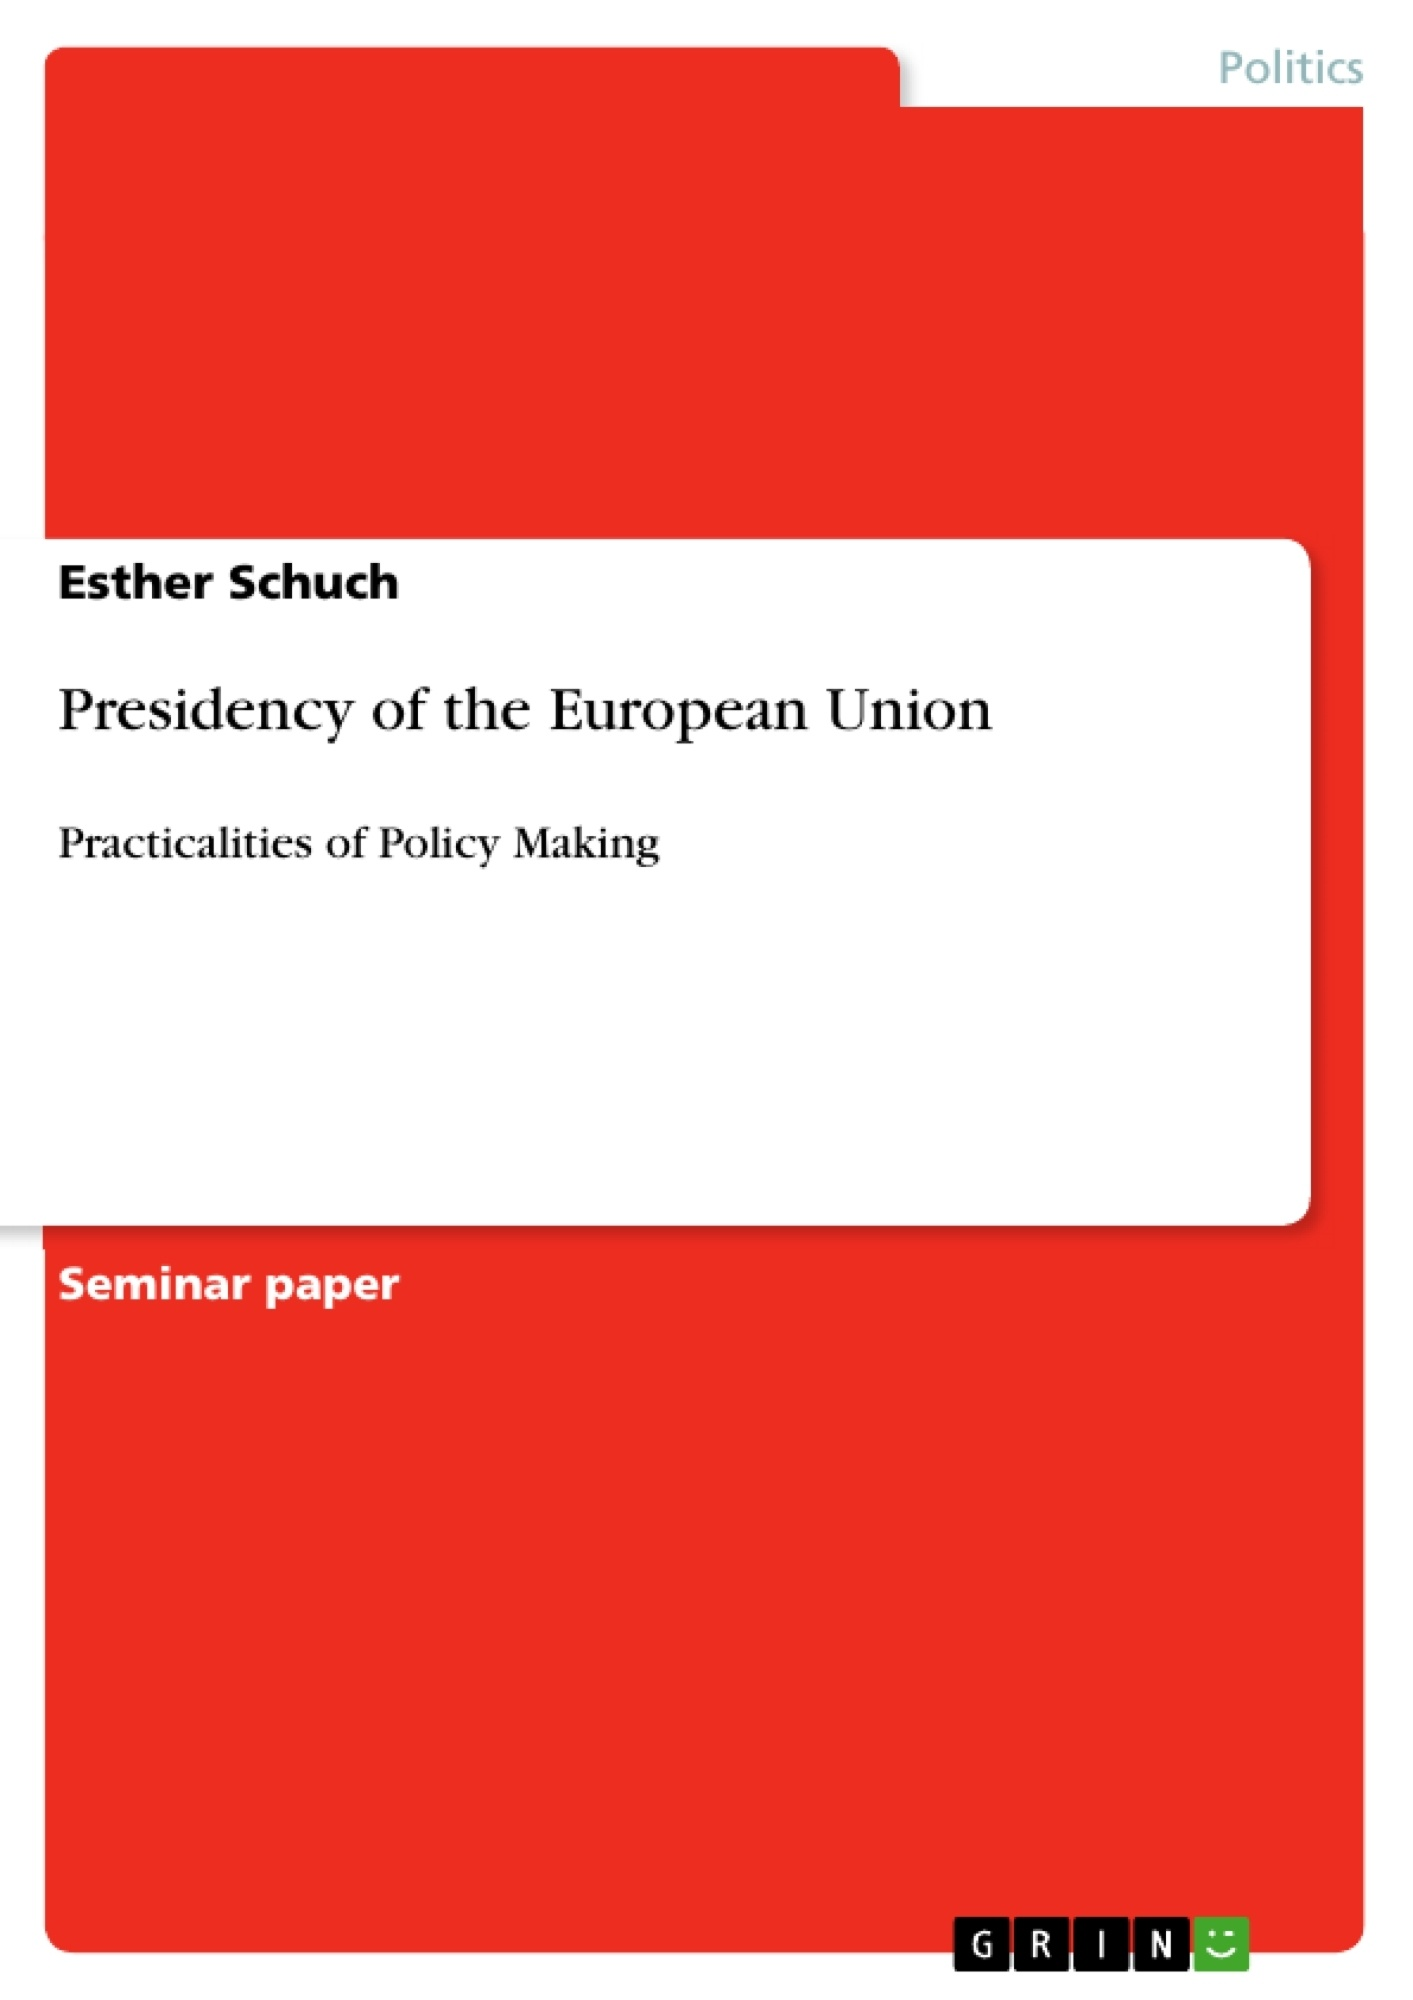 Title: Presidency of the European Union